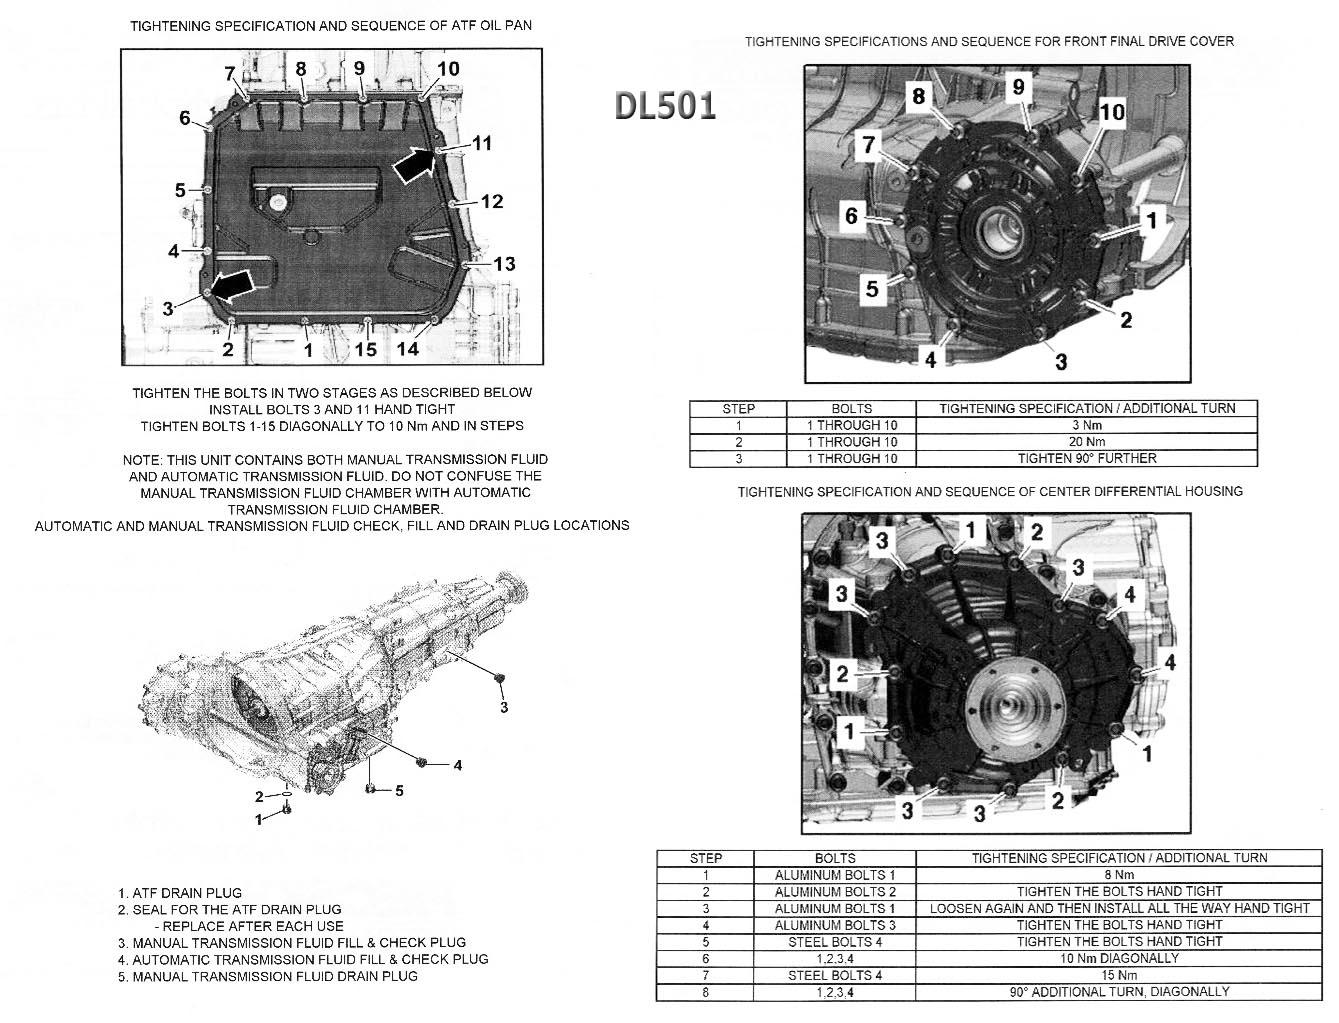 DL501 (0B5)